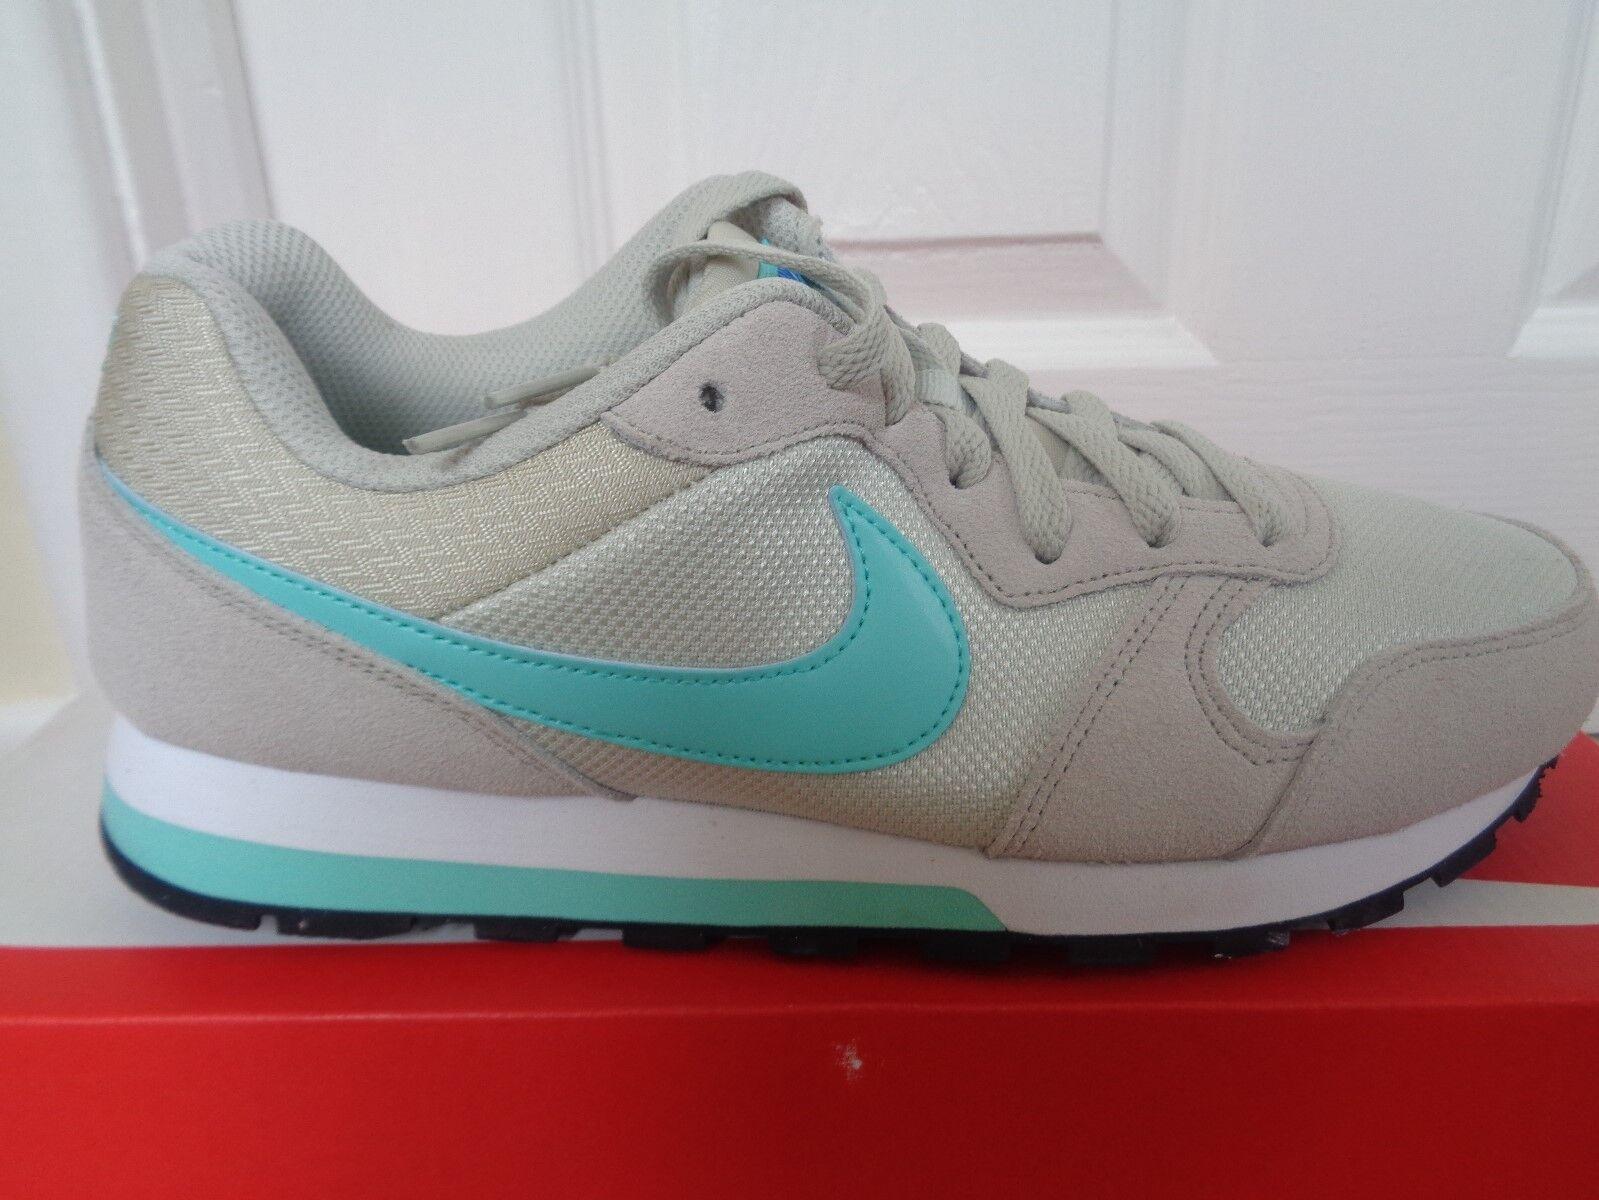 Nike MD Runner Runner Runner 2 Mujeres Zapatillas zapatillas 749869 034 UK 4.5 EU 38 nos 7 Nuevo + Caja  a la venta